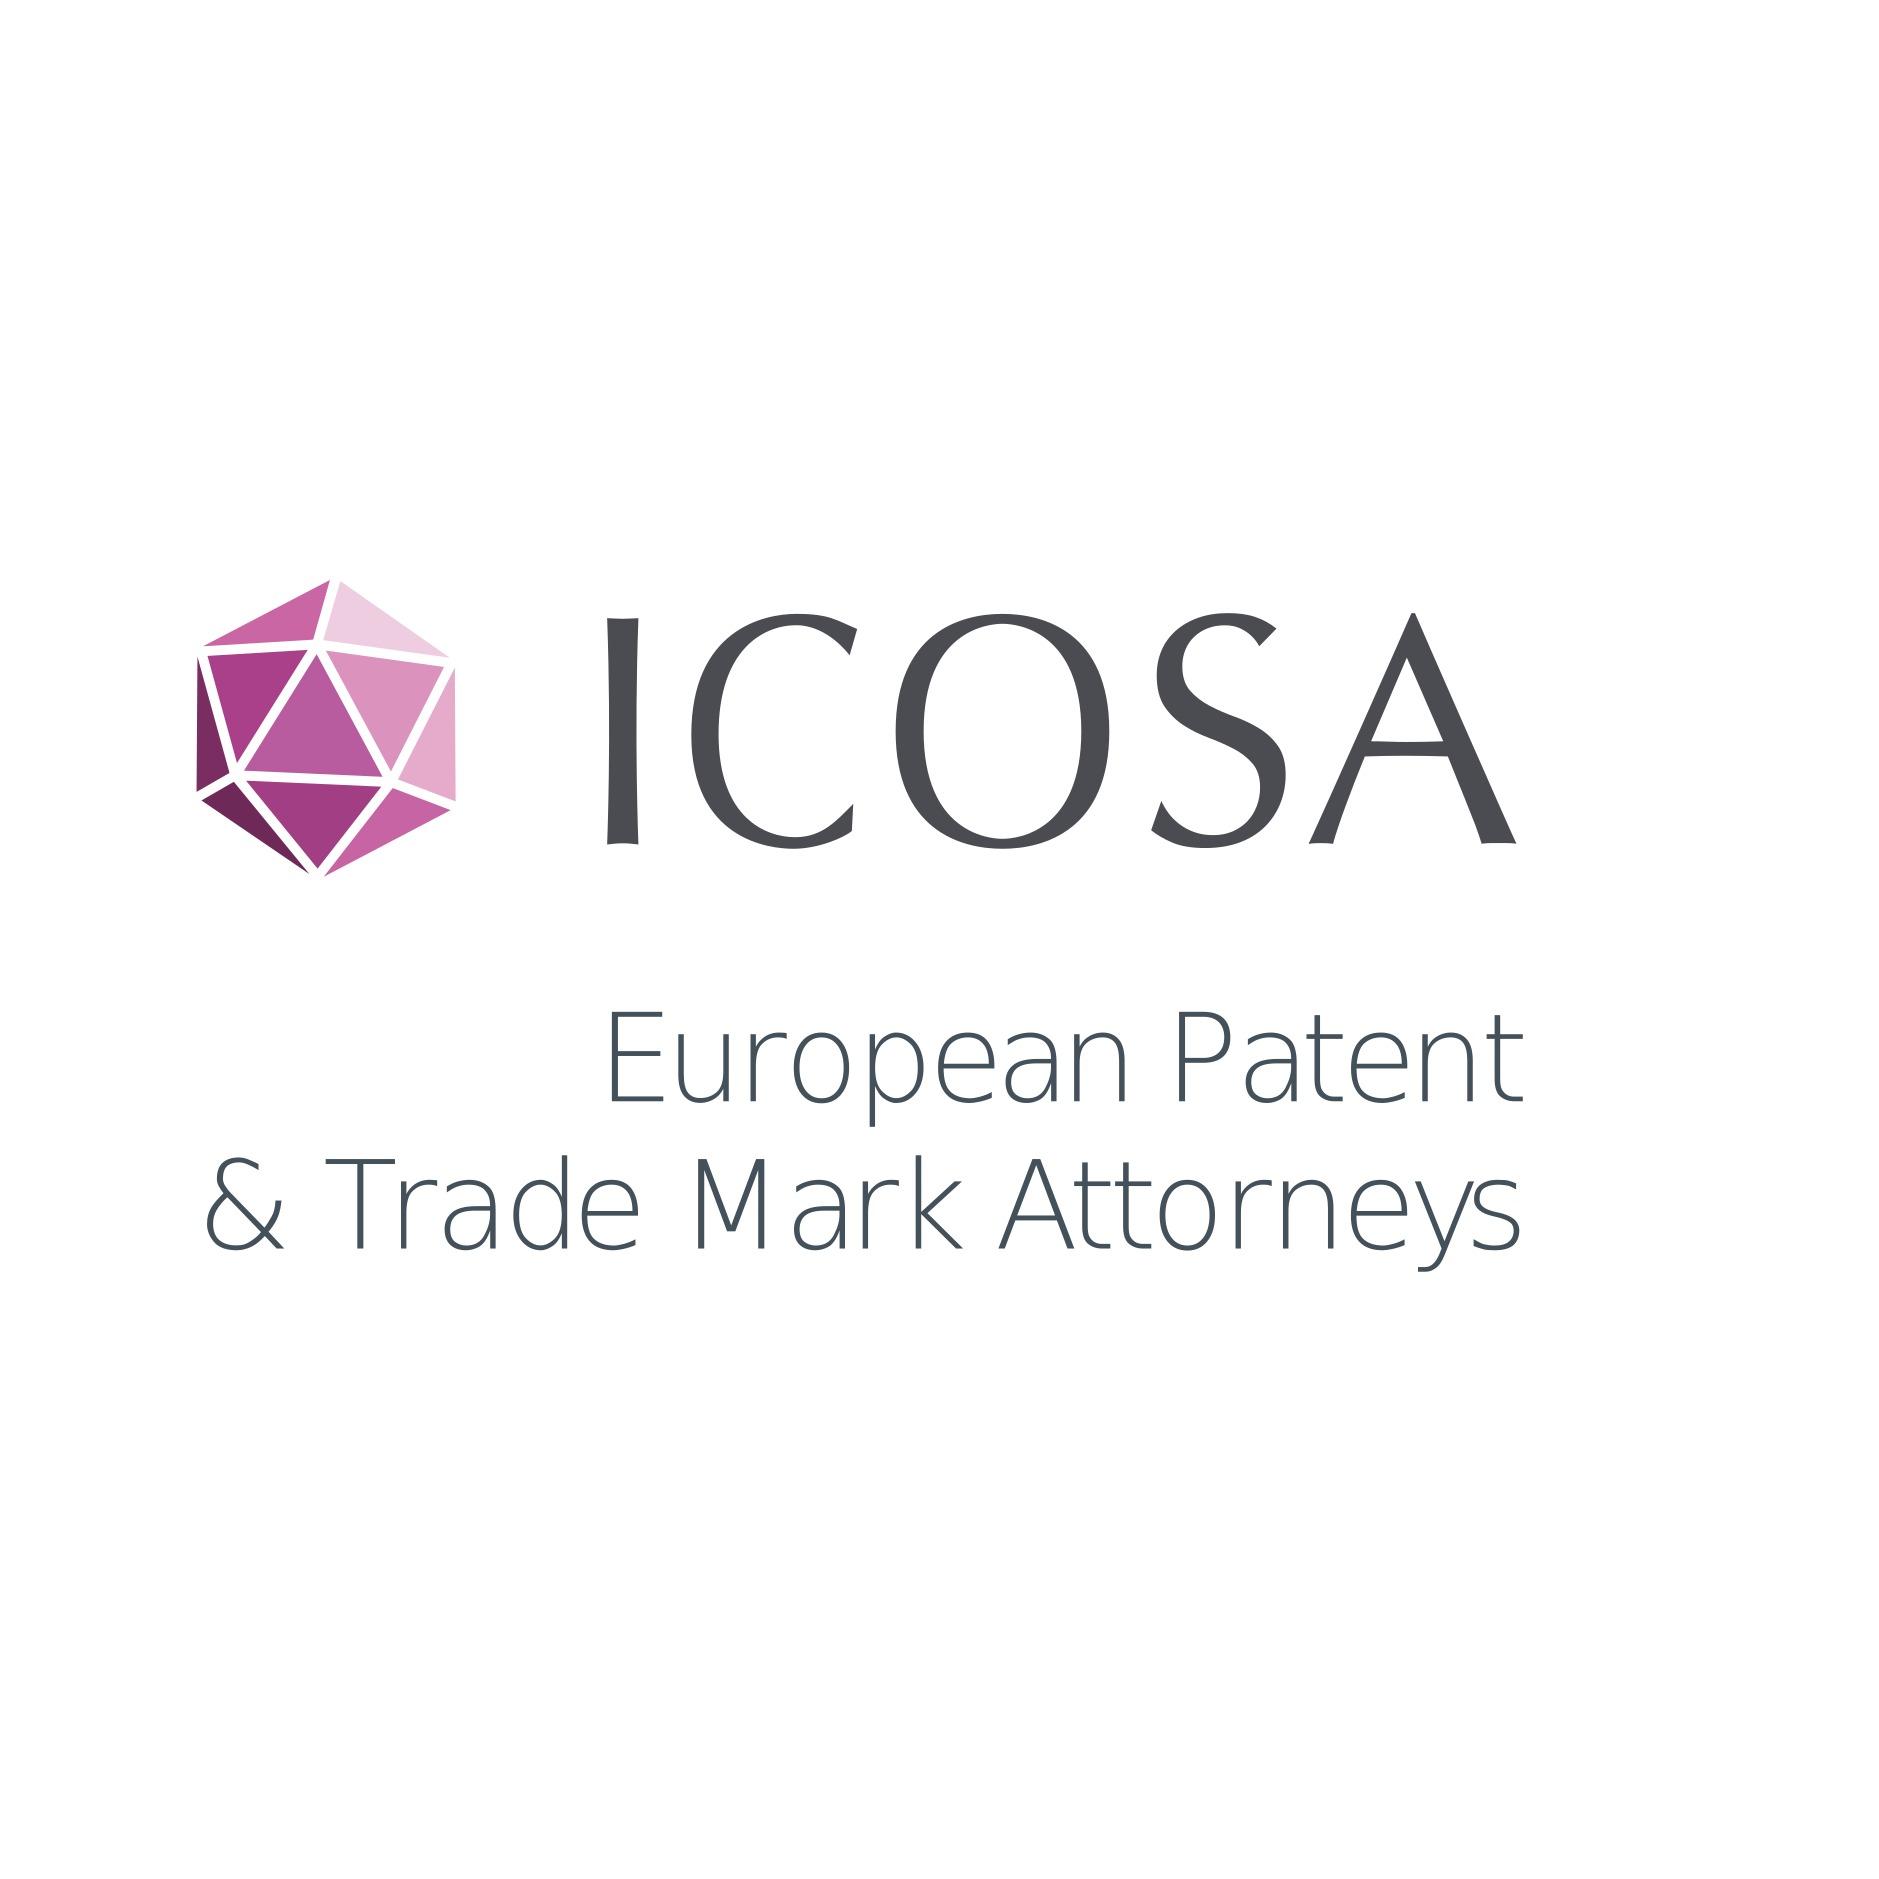 the ICOSA logo.